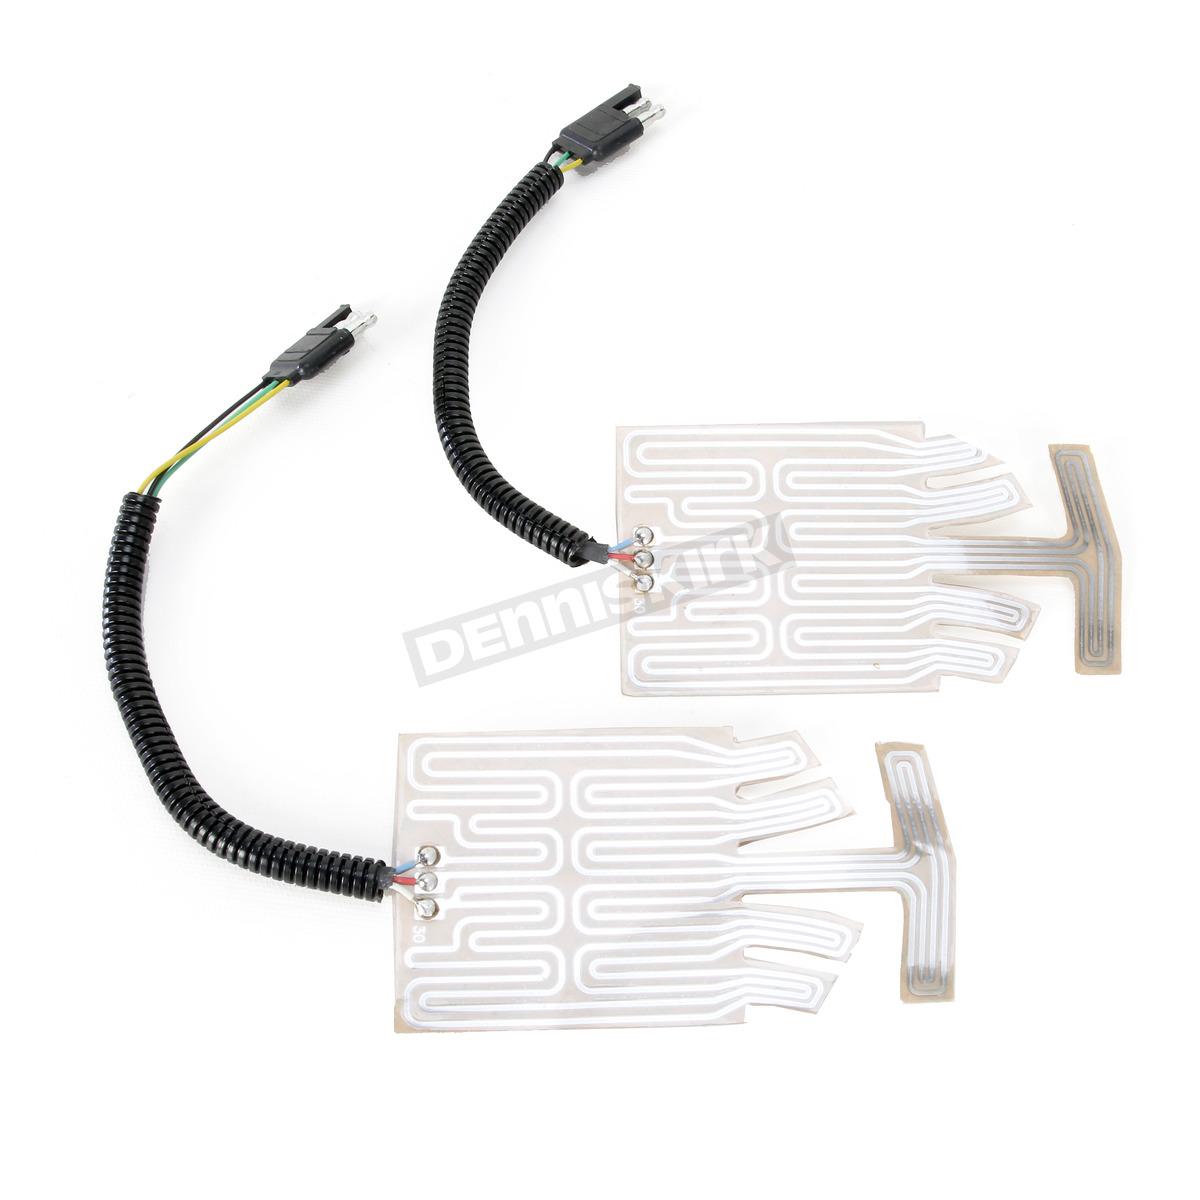 Race Shop Inc. Extended Hi Power Grip Heater Element Kit